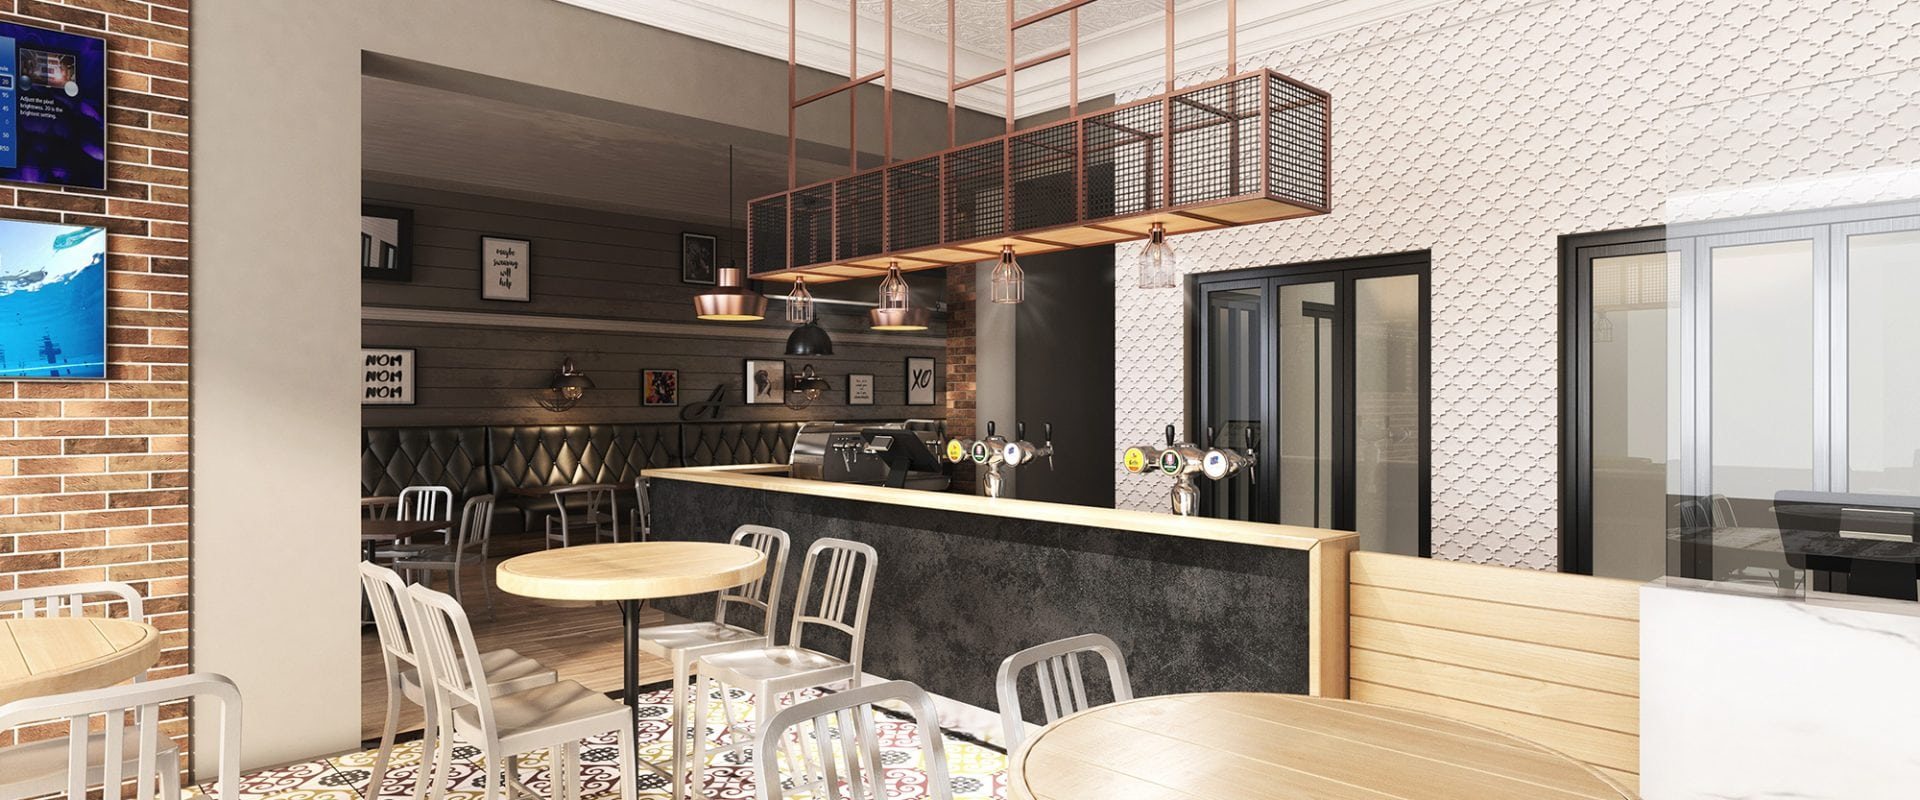 Hot concepts hotel club renovations interior design for Hotel club decor